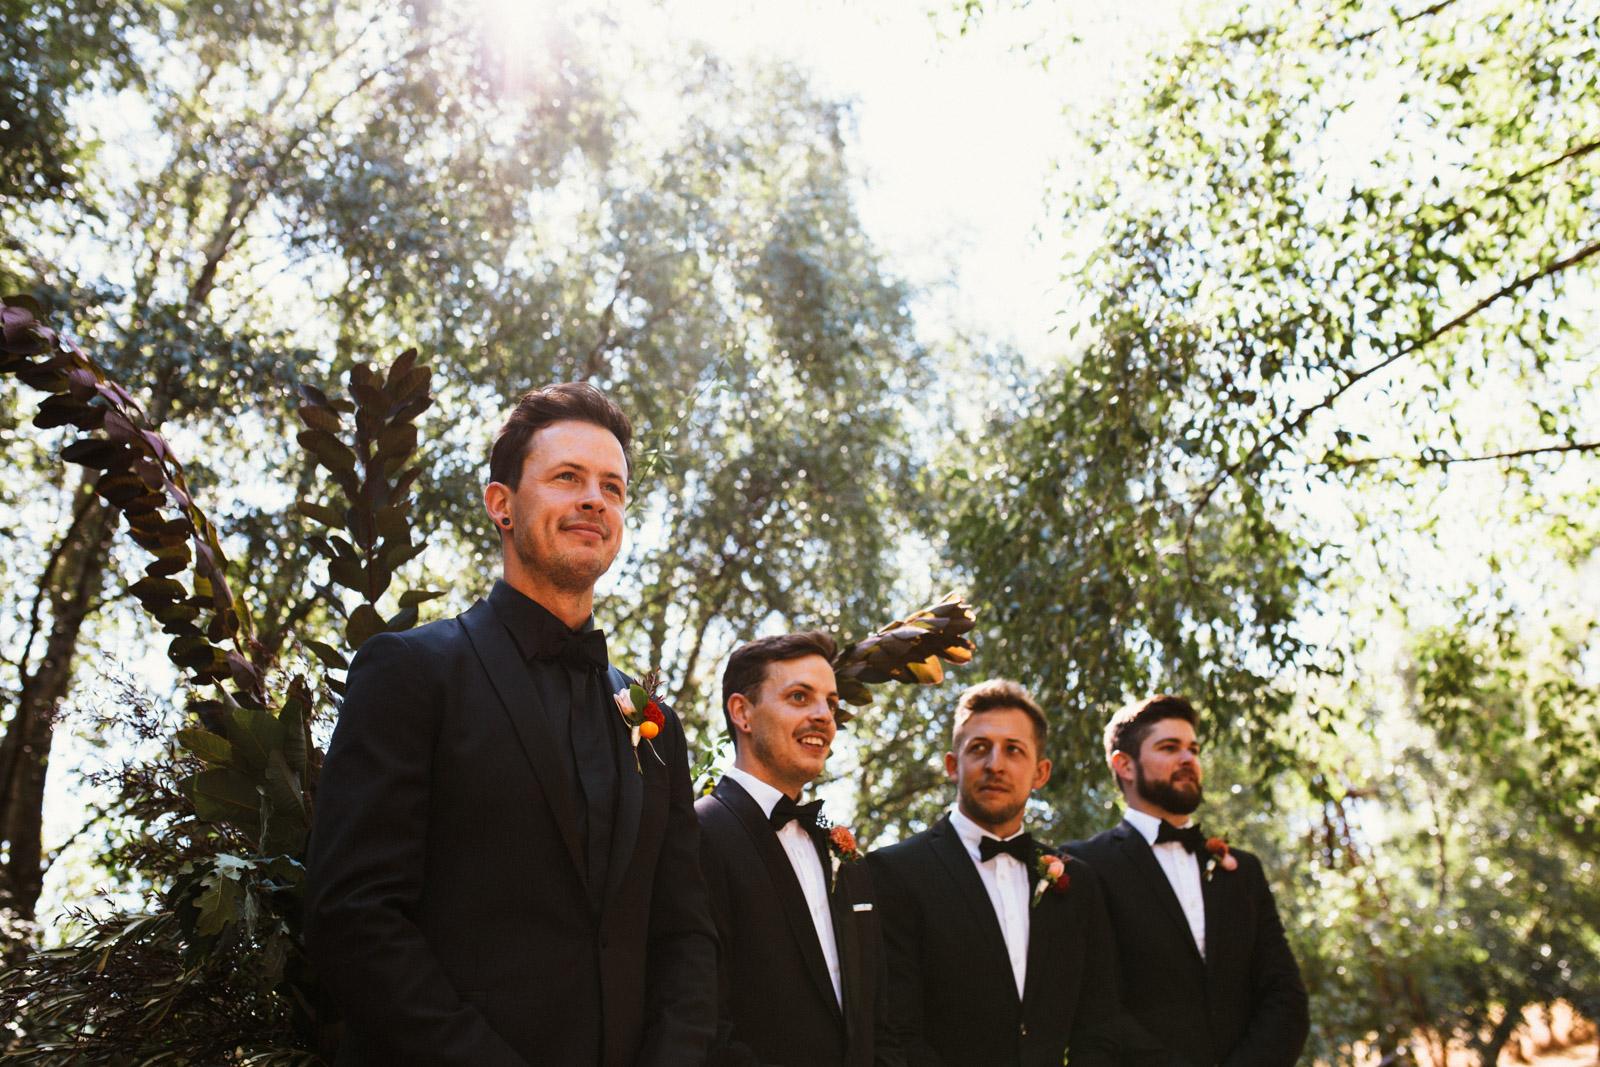 ZD-Melbourne Wedding Photographer-Dean Raphael-40.jpg